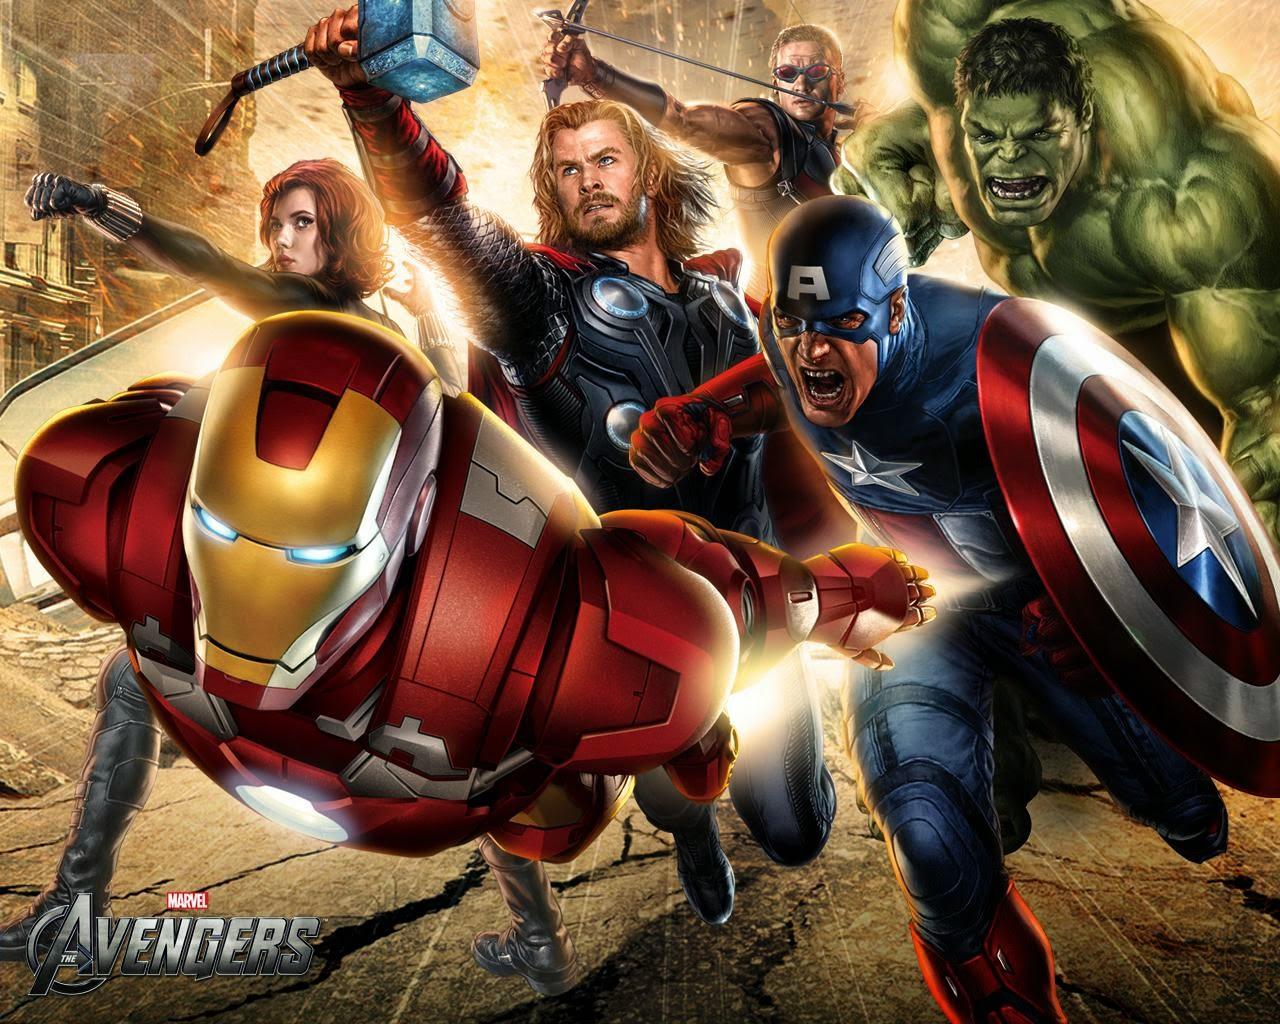 Marvel, Kapitan Ameryka, czarna Wdowa, Iron Man, Thor, Hulk, Avengers, kinowe uniwersum marvela